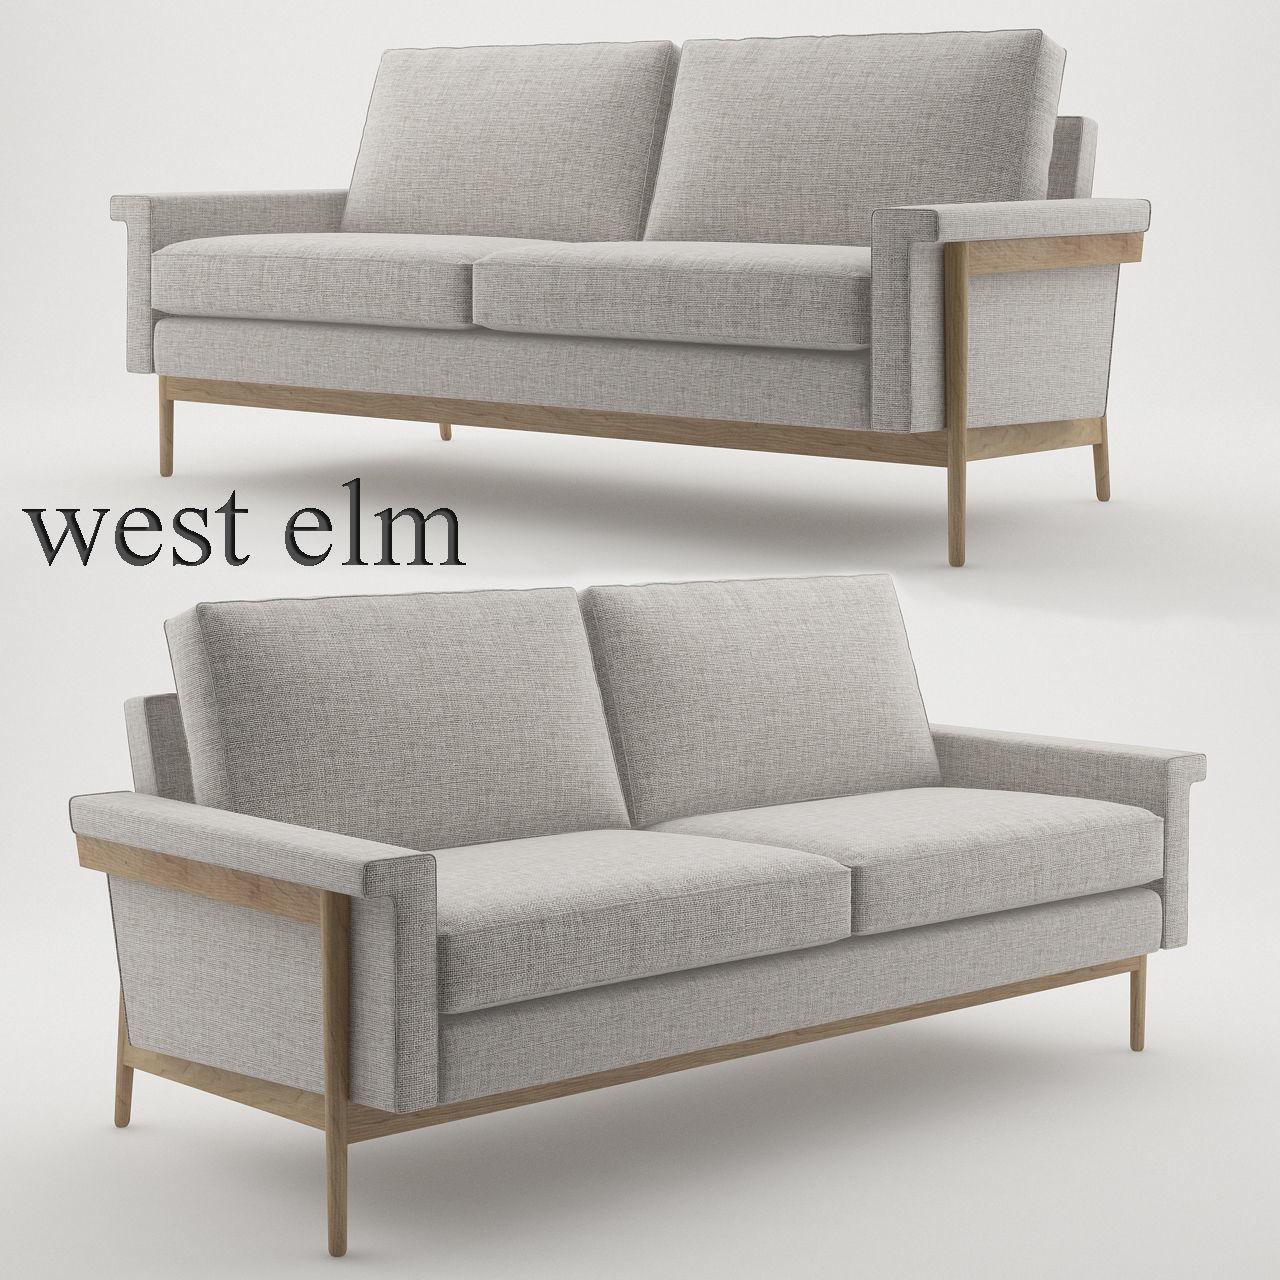 Enjoyable Leon Wood Frame Loveseat 68 By West Elm 3D Model Machost Co Dining Chair Design Ideas Machostcouk